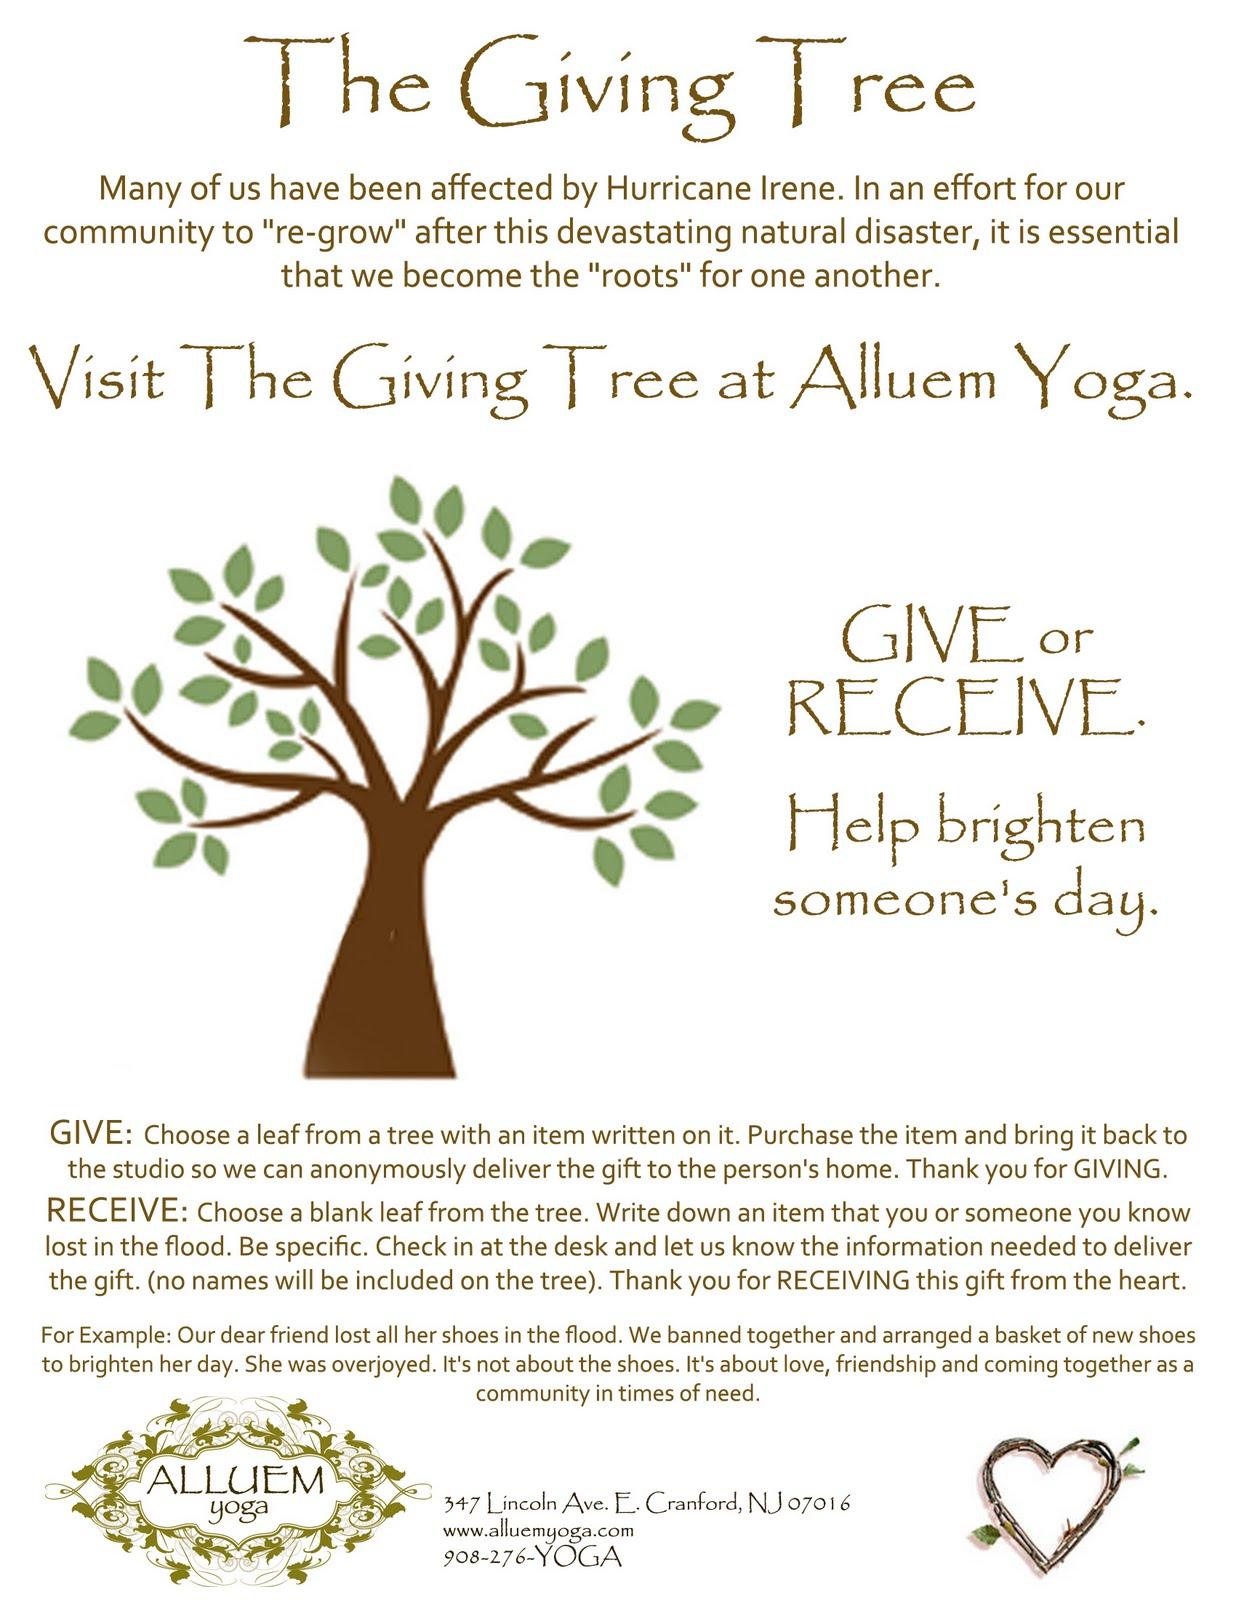 Alluem Kids The Giving Tree At Alluem Yoga